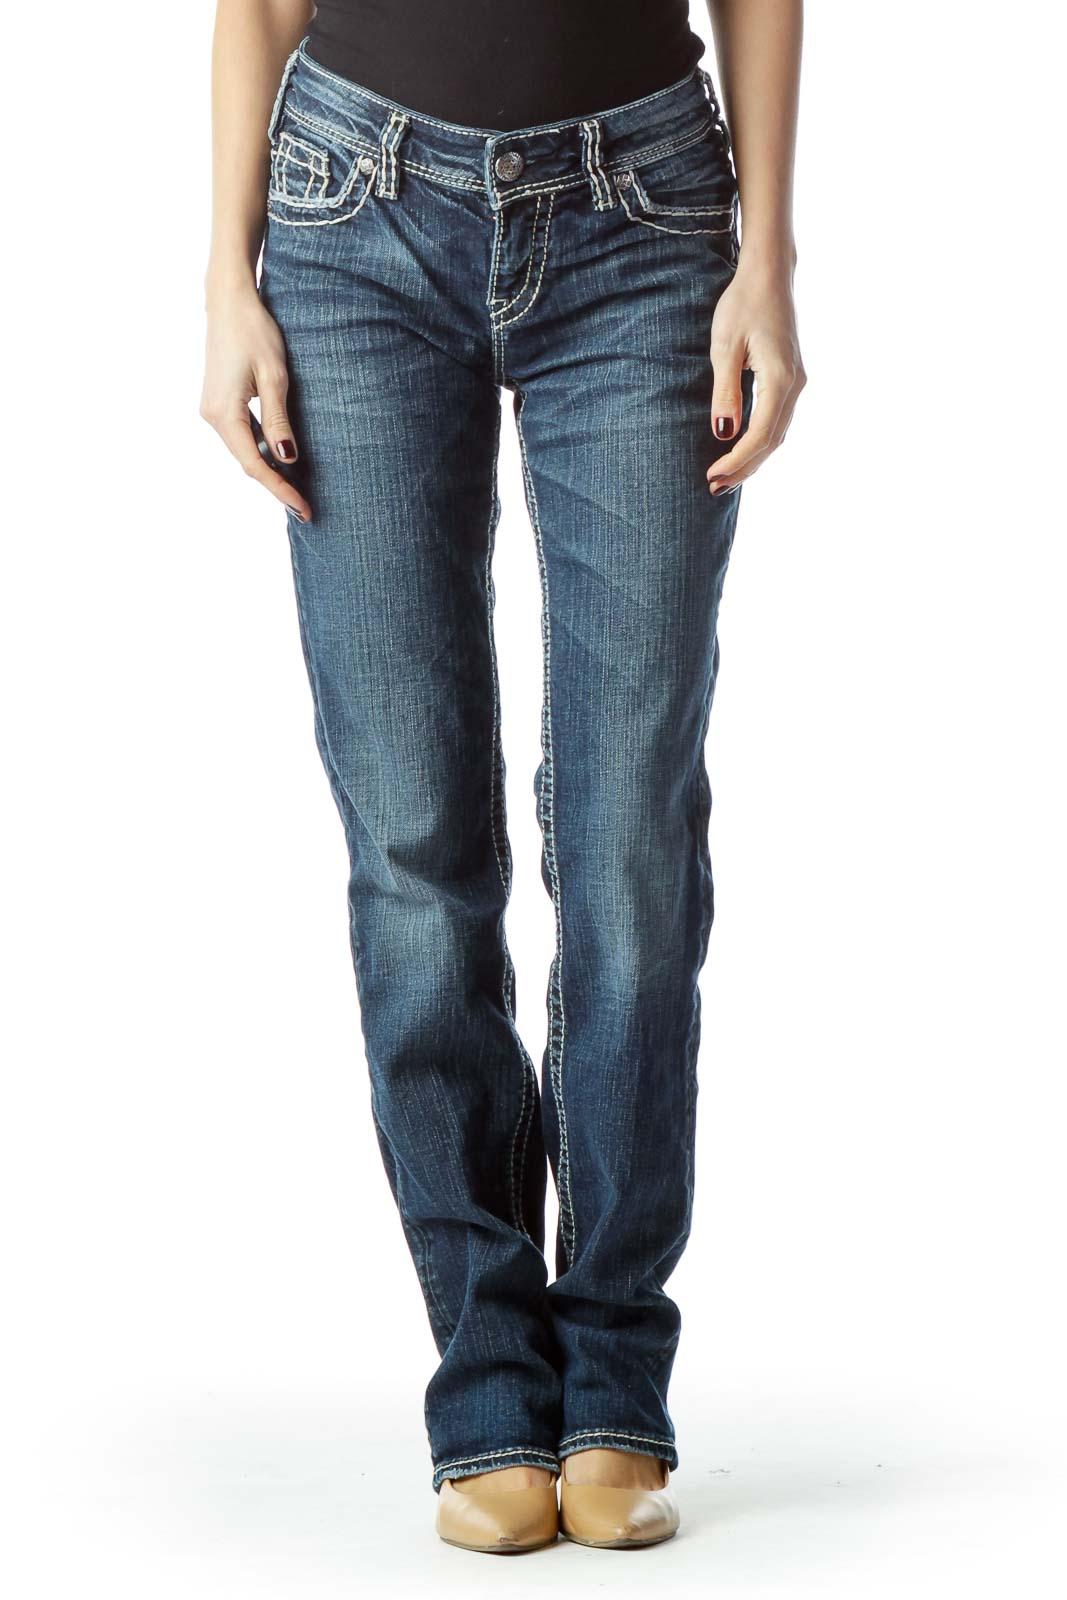 Blue Medium Wash Stitched Denim Jeans Front